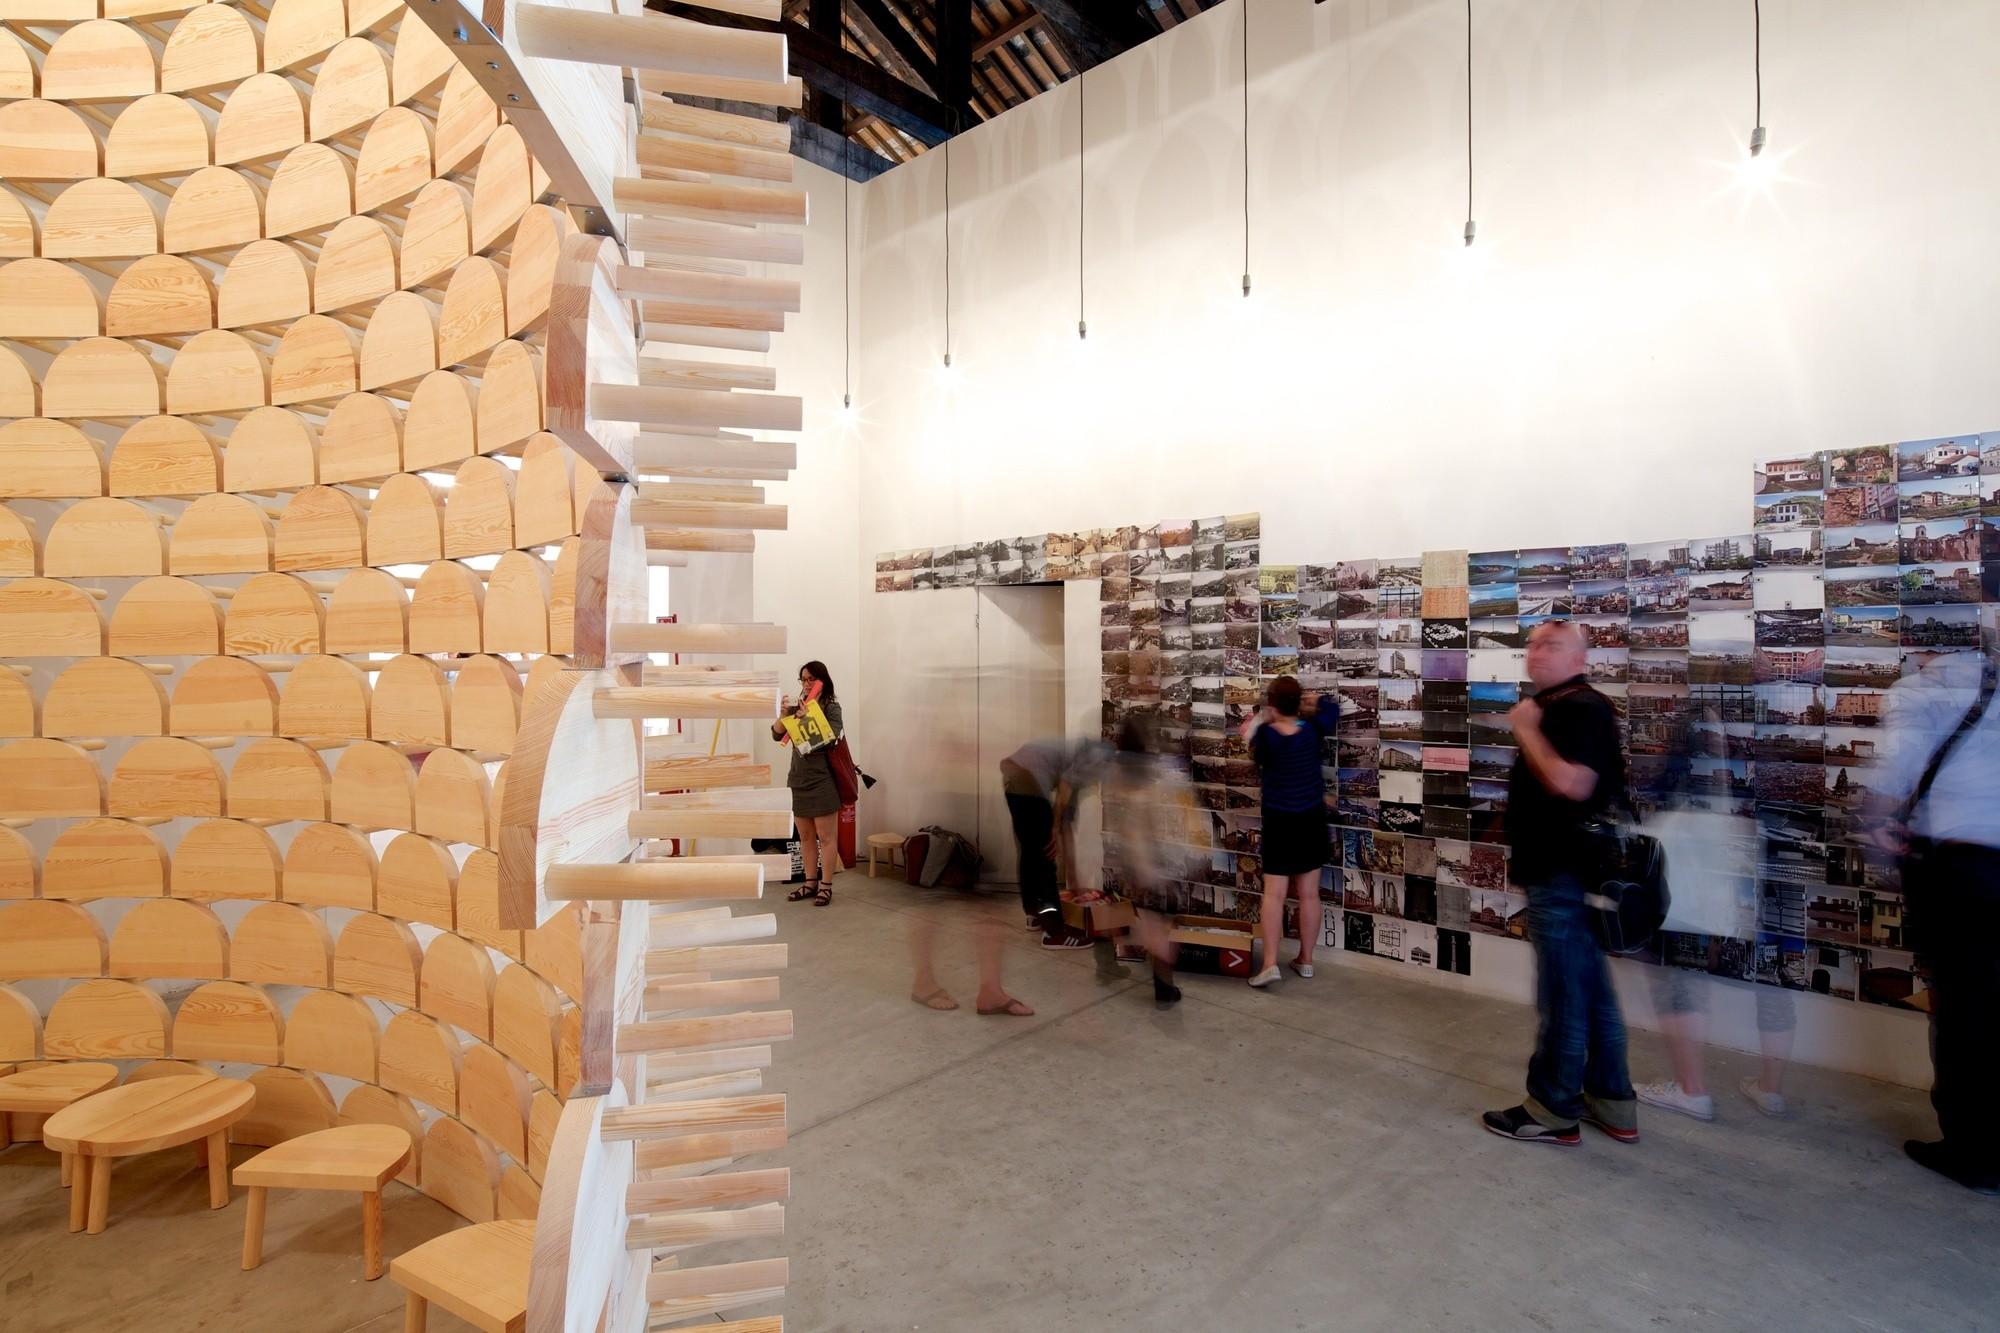 'Visibility (Imposed Modernity)' – Kosovo's Pavilion at the Venice Biennale 2014. Image © Nico Saieh